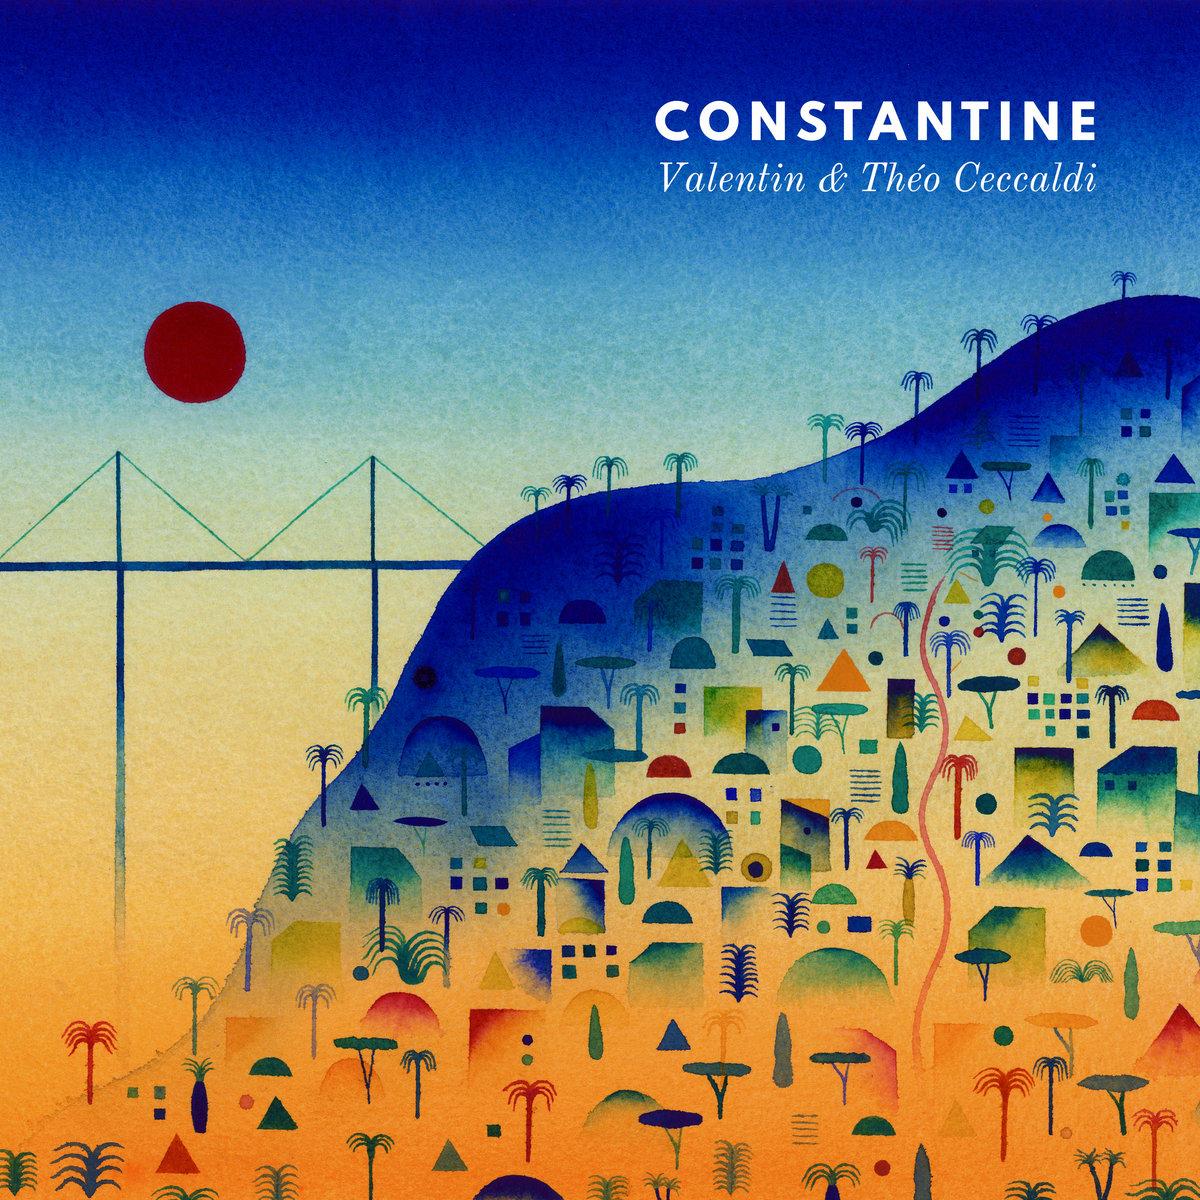 THÉO CECCALDI - Valentin Ceccaldi, Théo Ceccaldi & le Grand Orchestre du Tricot : Constantine cover